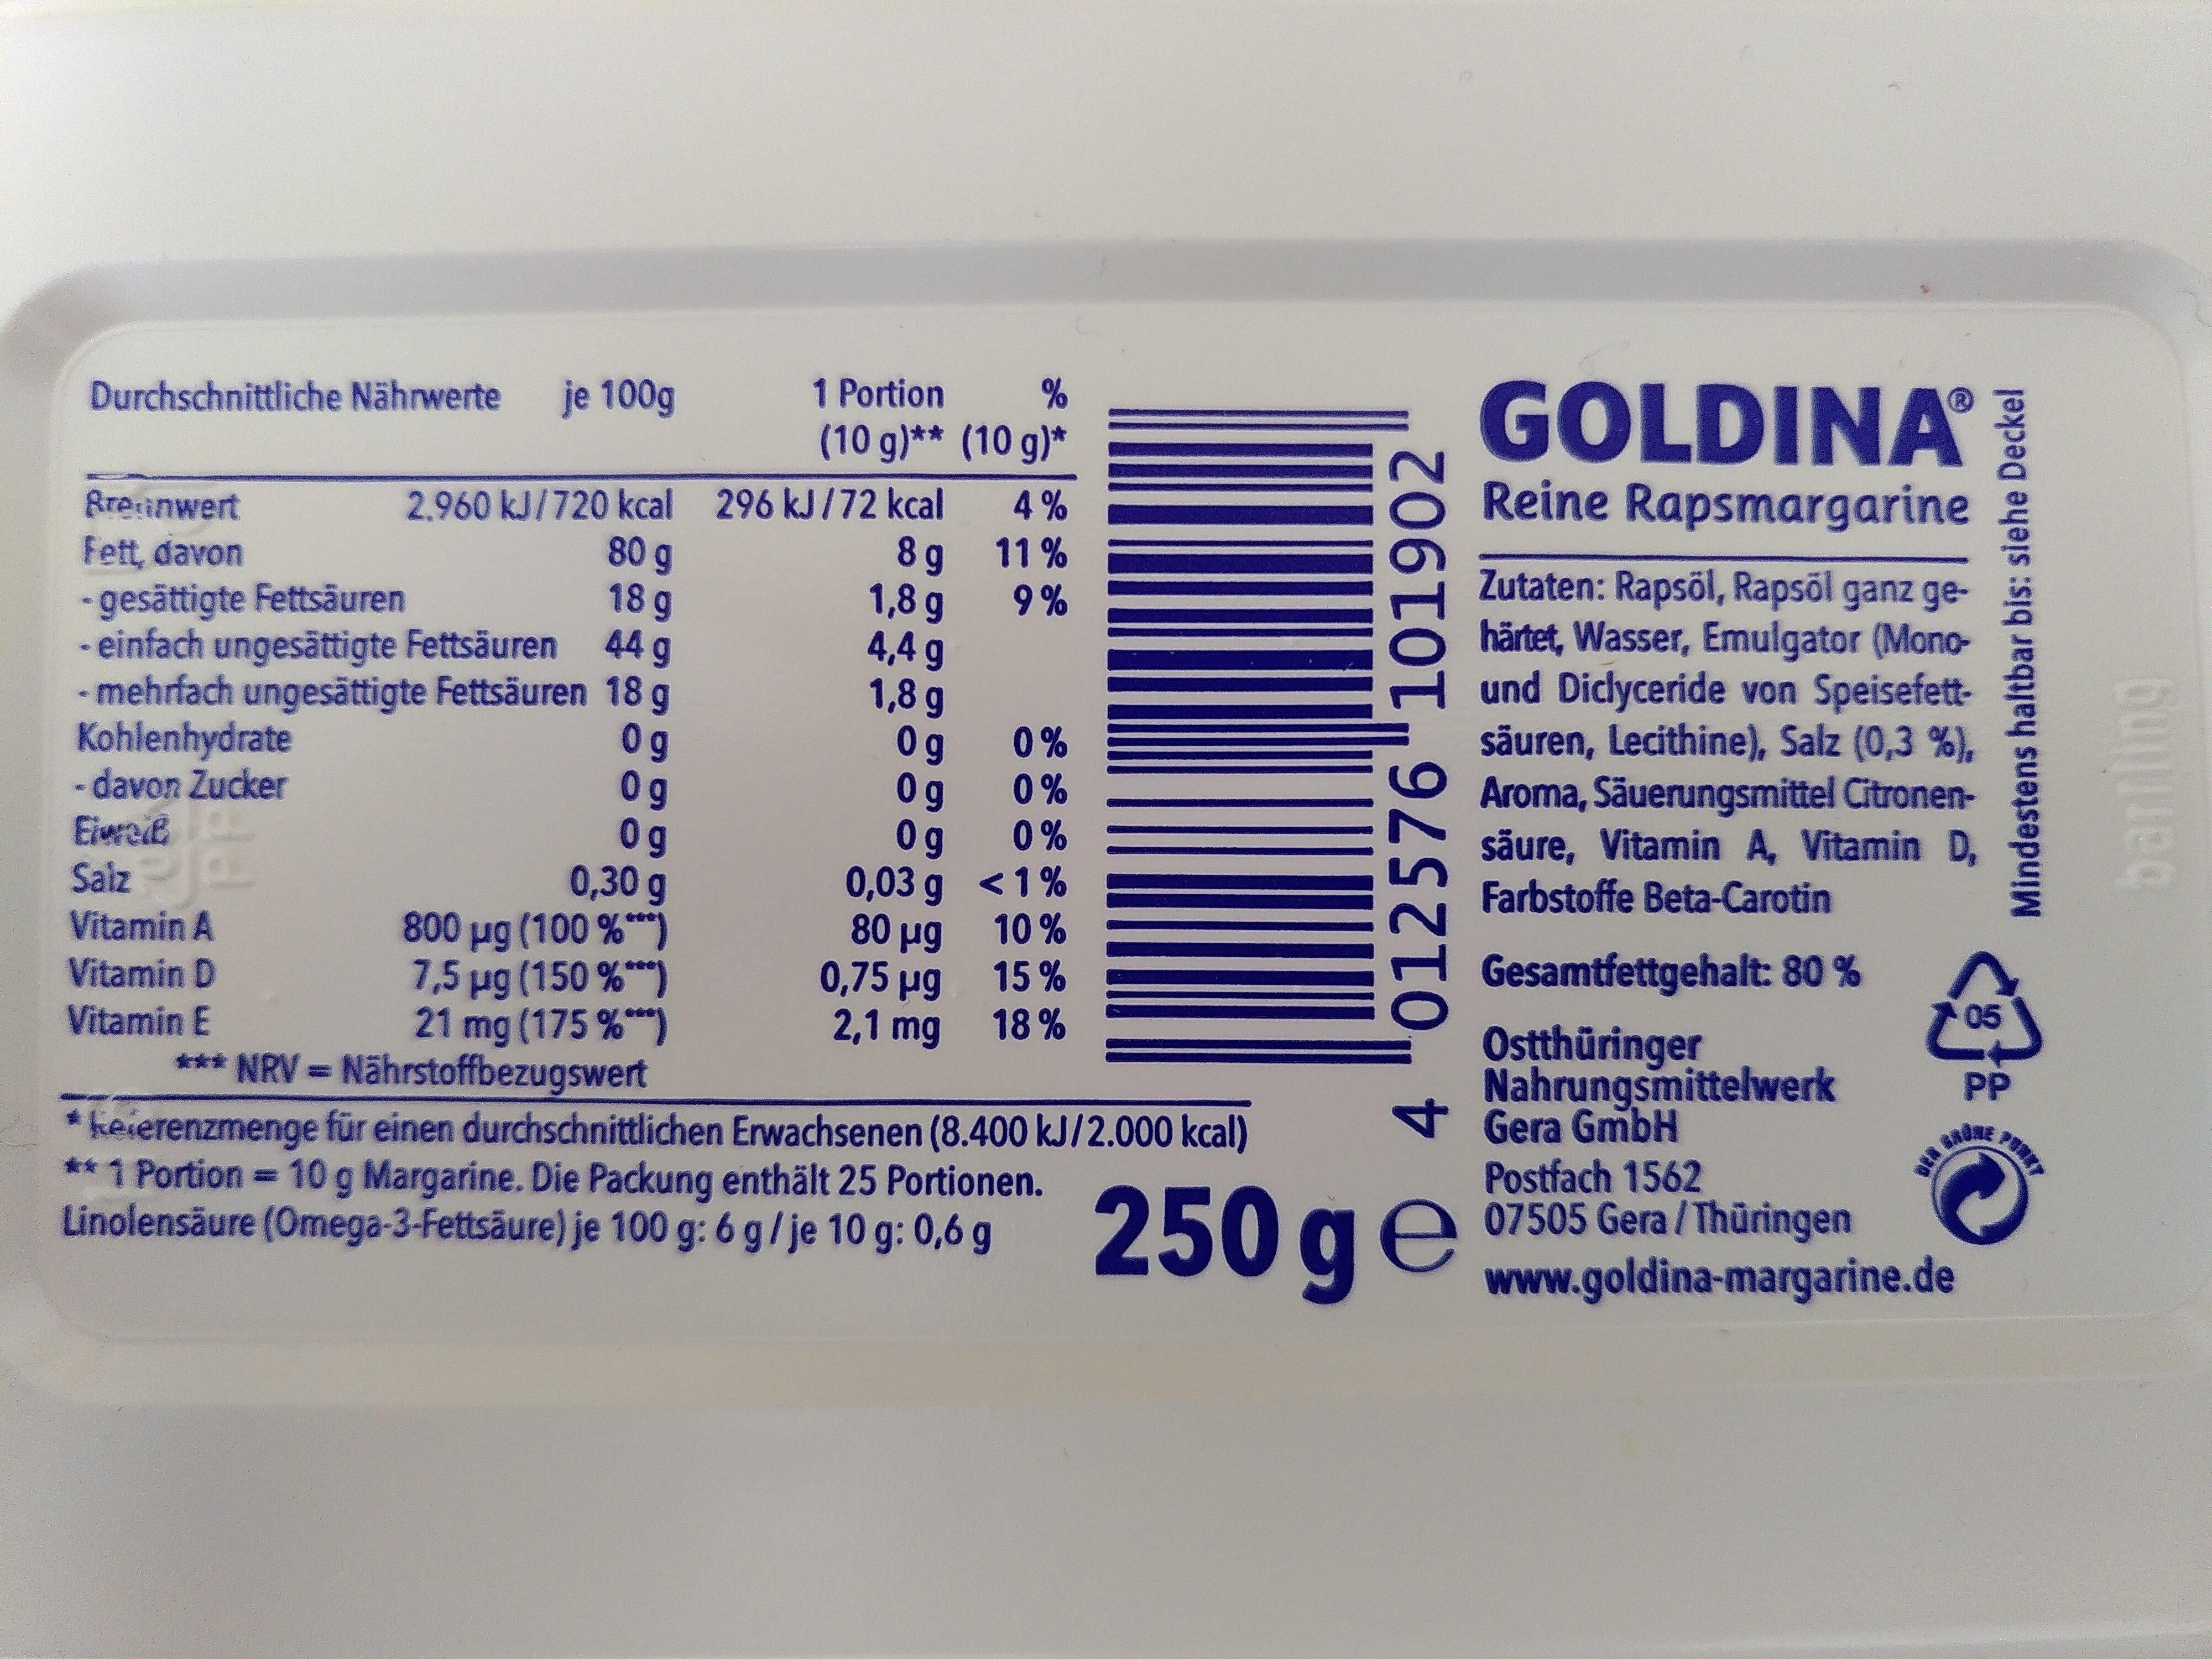 Goldina Reine Rapsmargarine - Ingredients - de